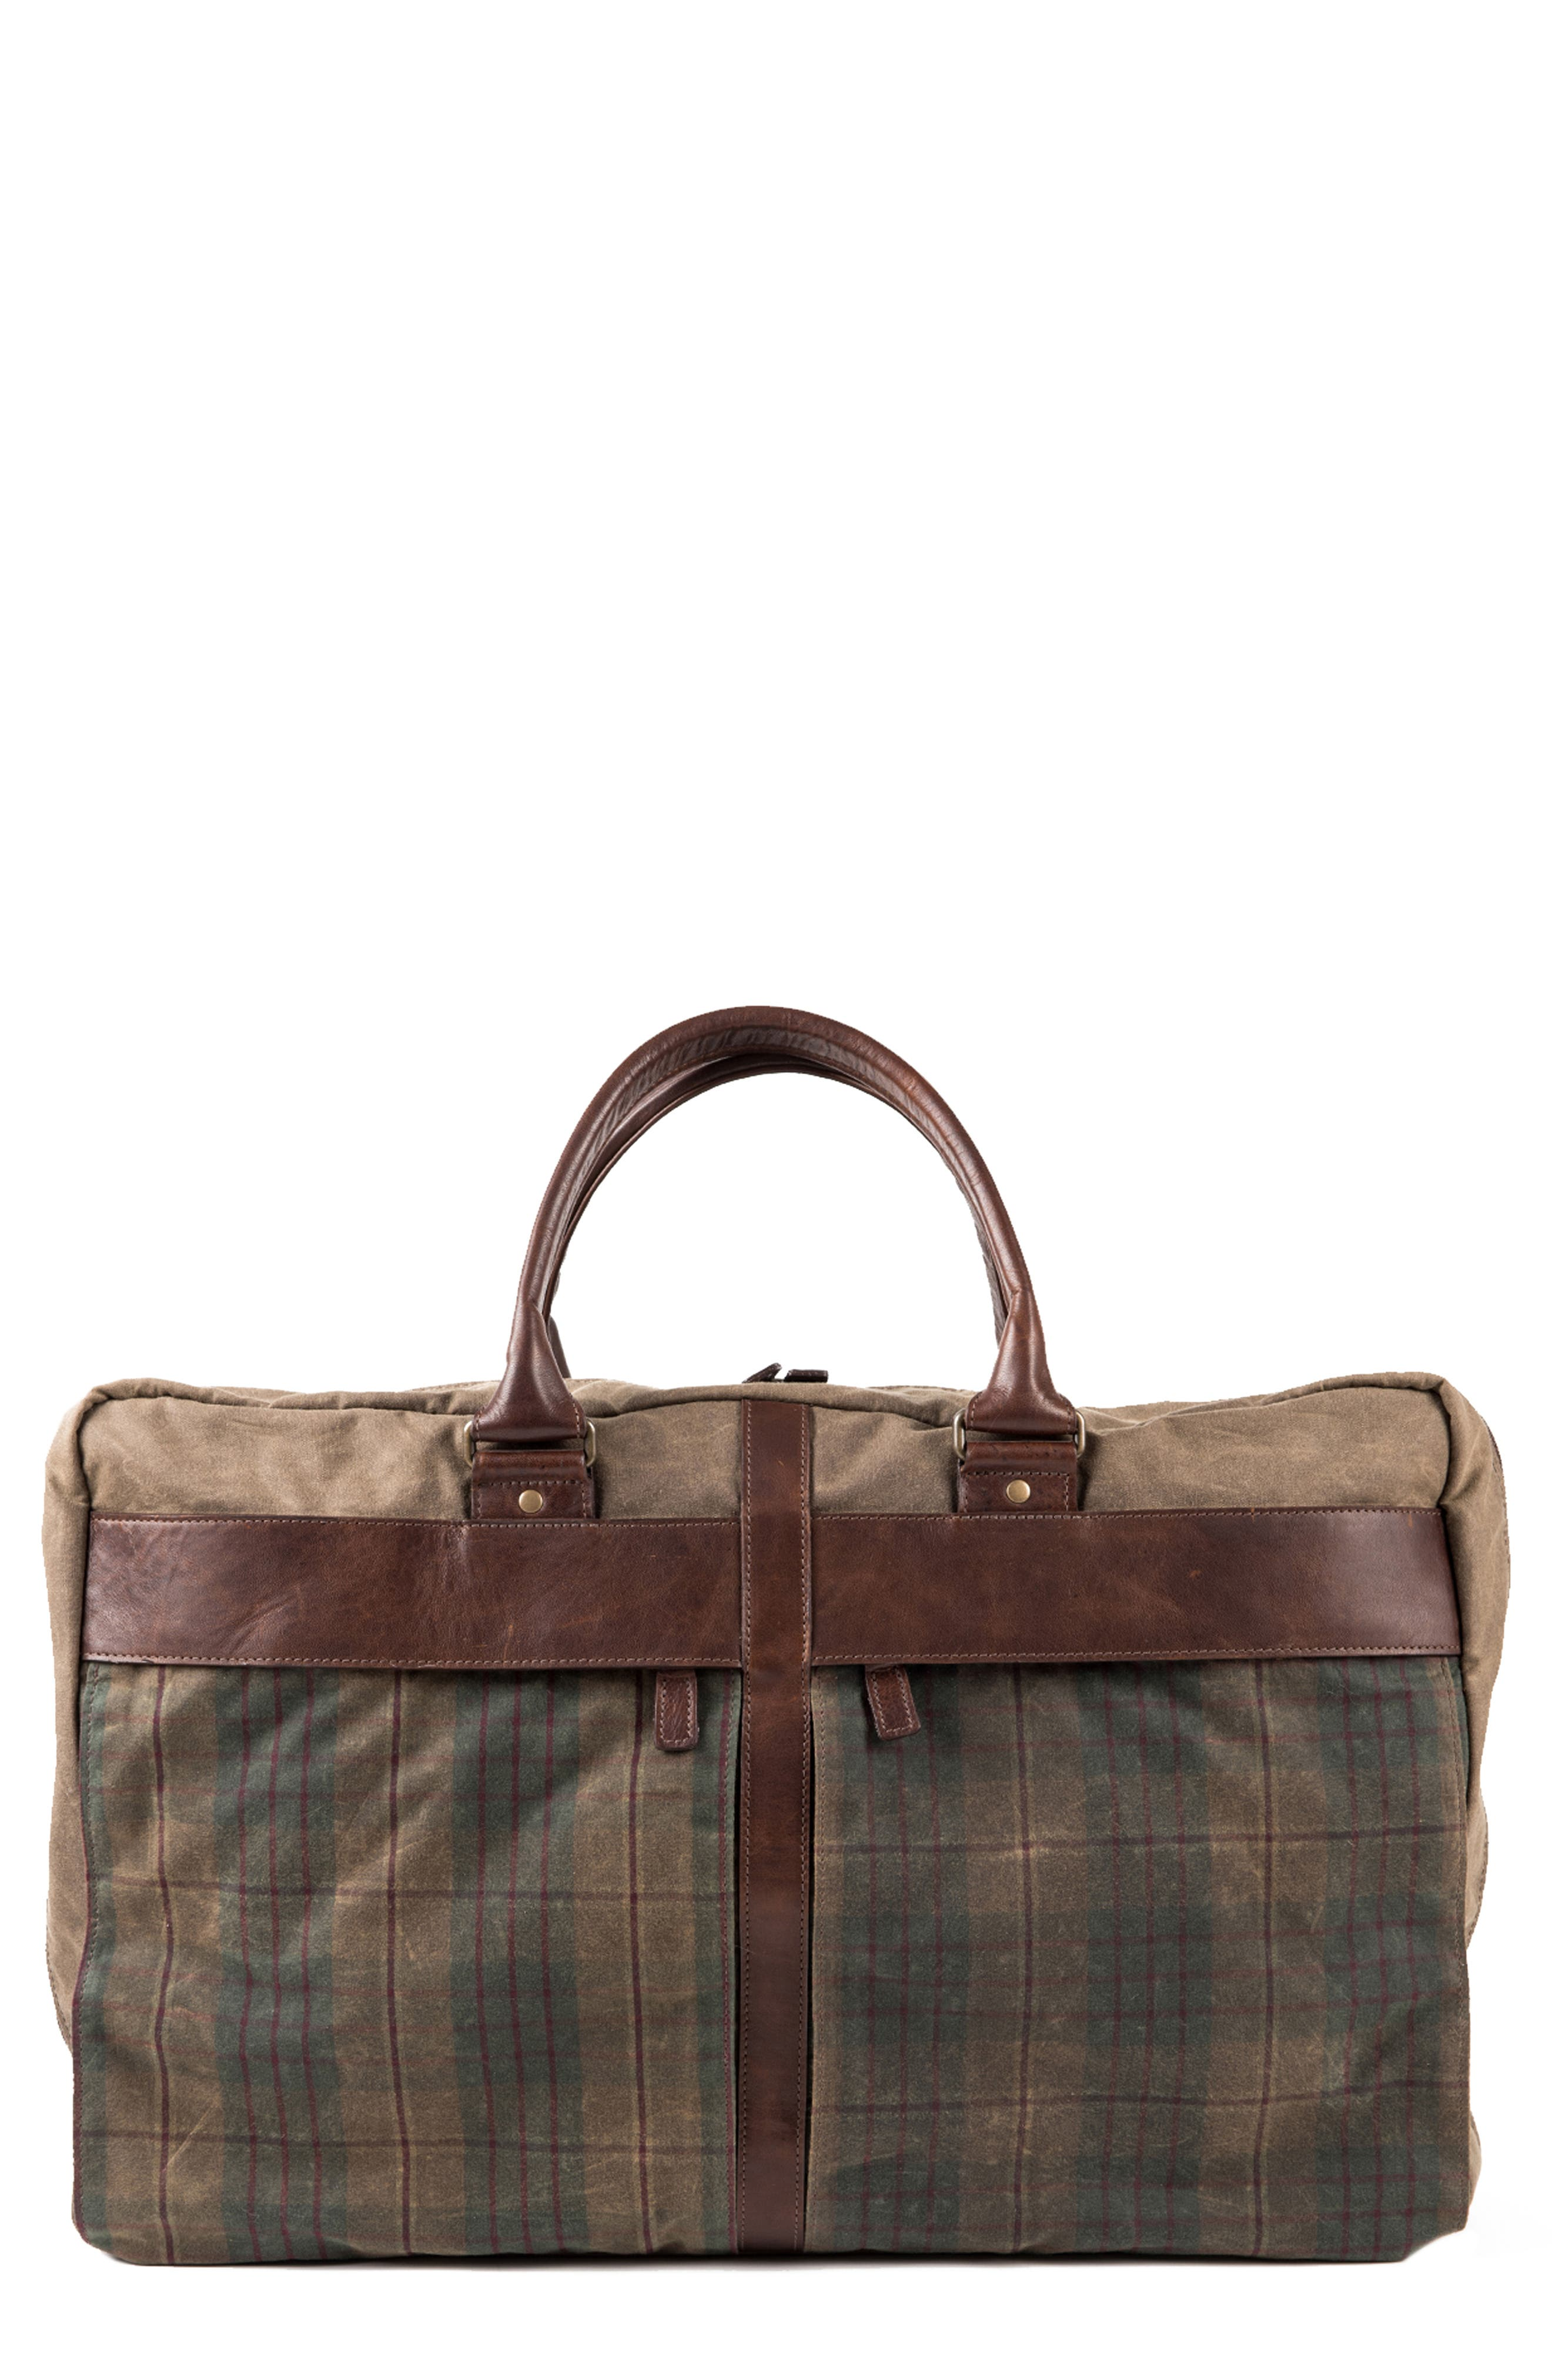 Tinsley Trifold Garment Bag,                             Main thumbnail 1, color,                             Baldwin Oak